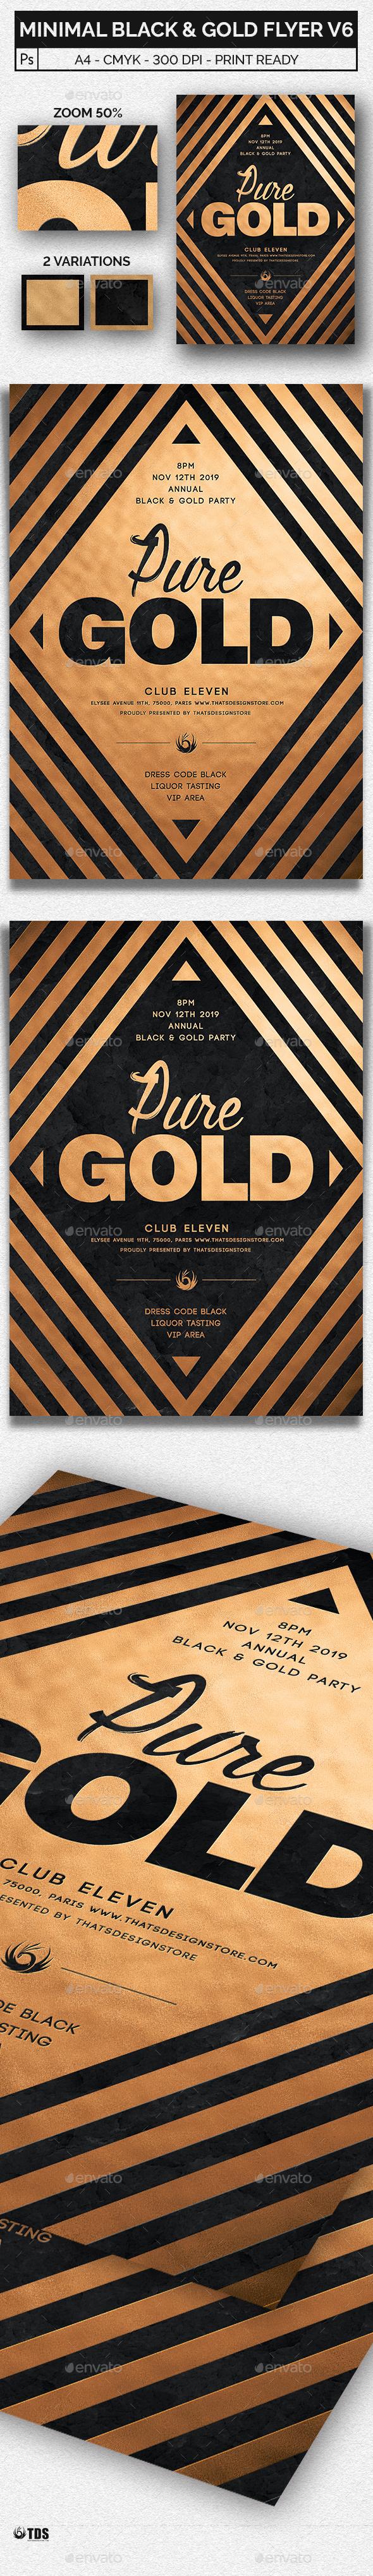 GraphicRiver Minimal Black and Gold Flyer Template V6 20480685